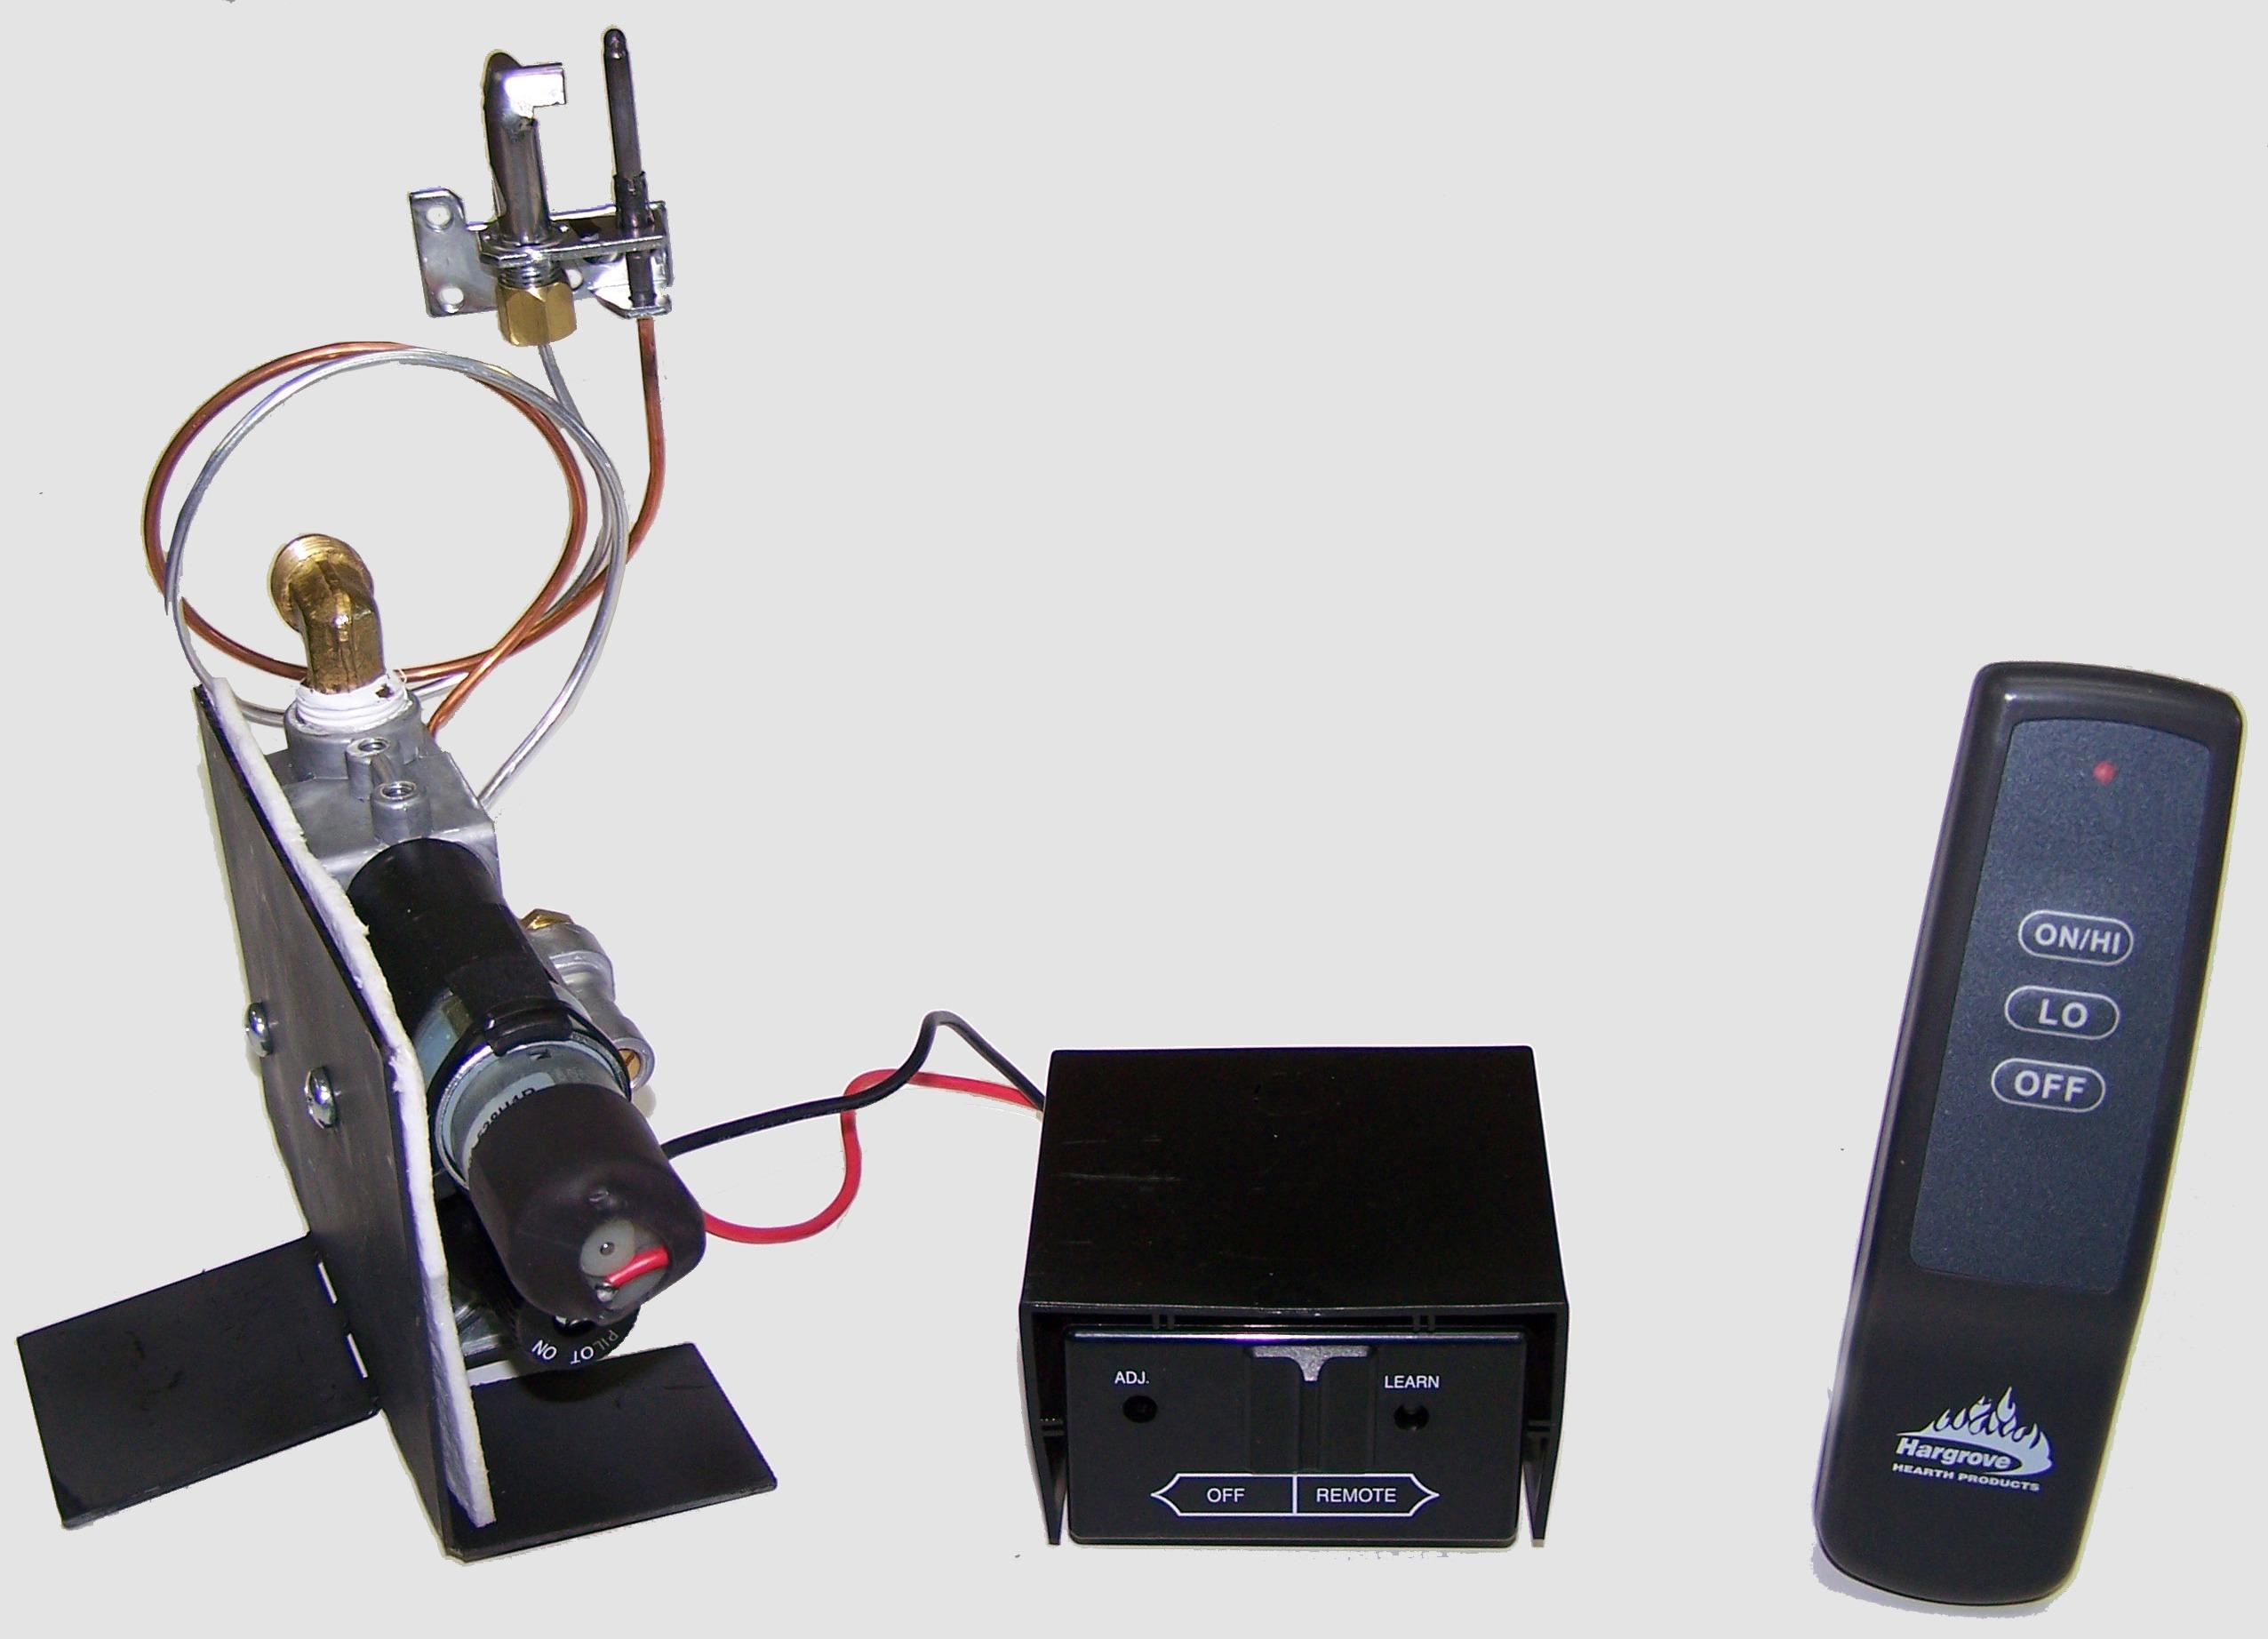 Digital Electronic Ignition Arizona Gas Products